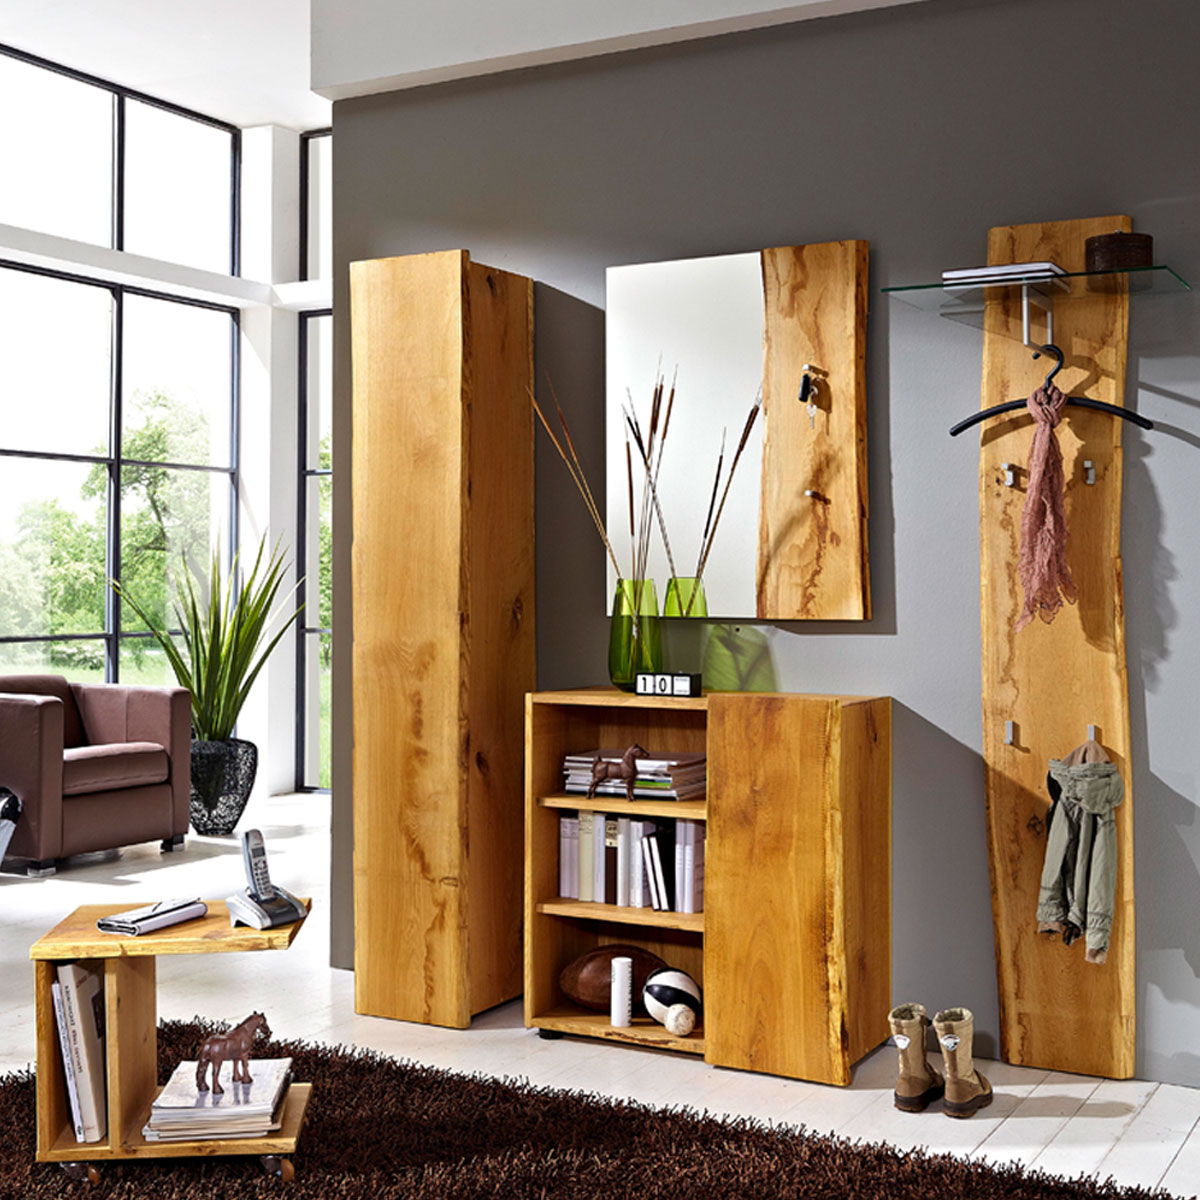 Skalik Meble Woodline Garderobe Garderobenpaneel Mit Glasplatte